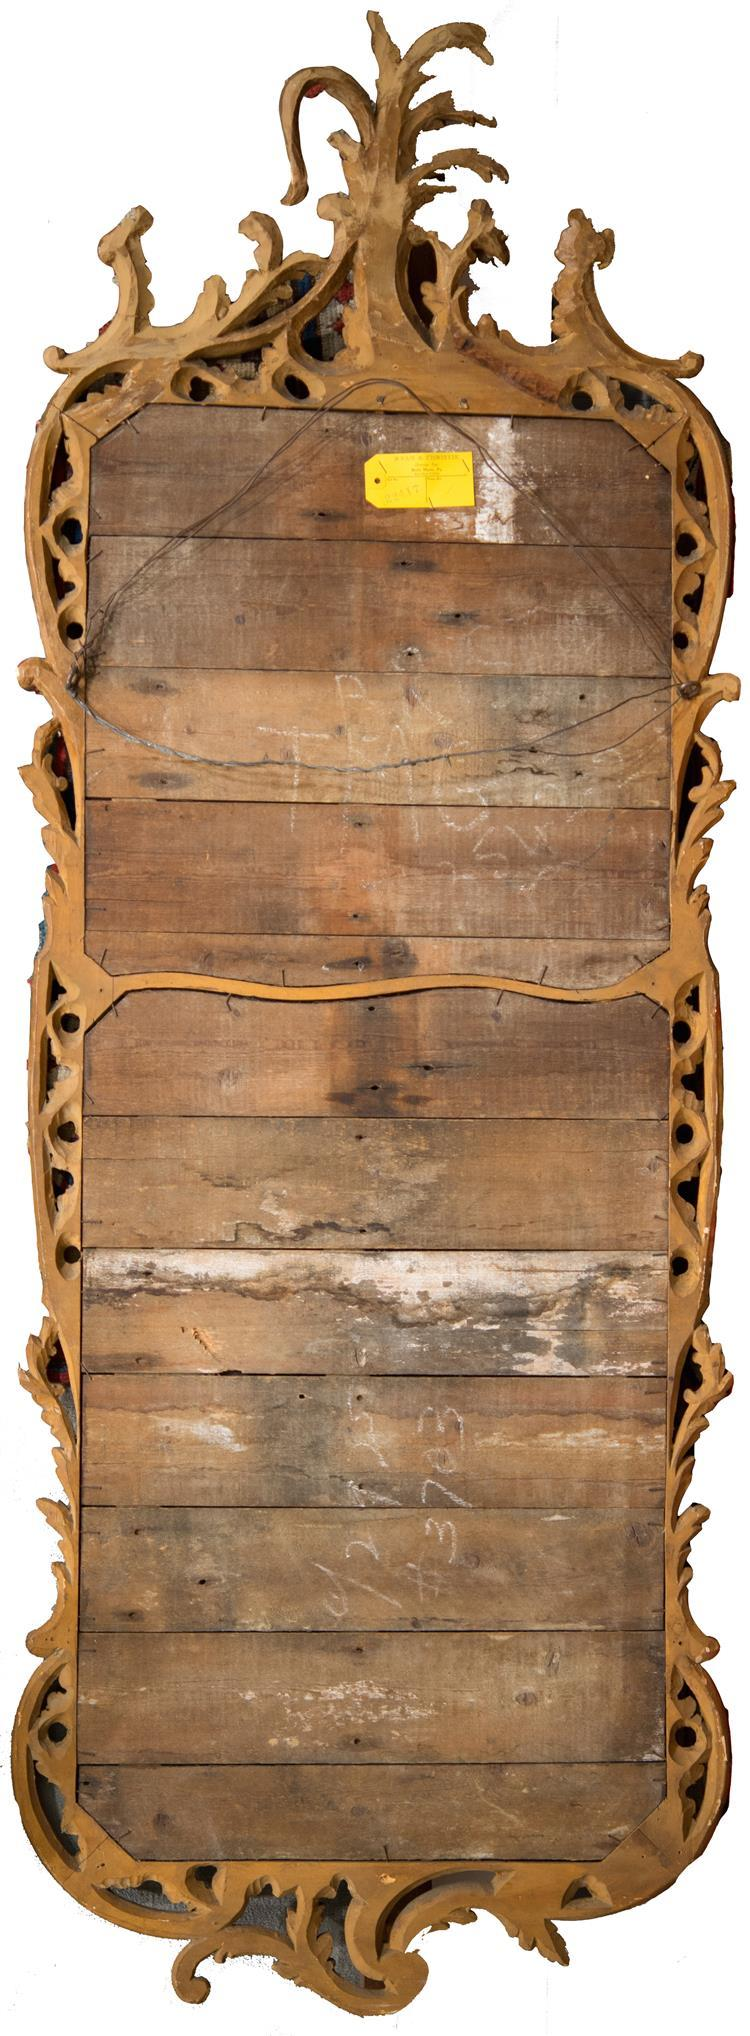 PAIR OF GEORGIAN CARVED GILTWOOD PIER MIRRORS